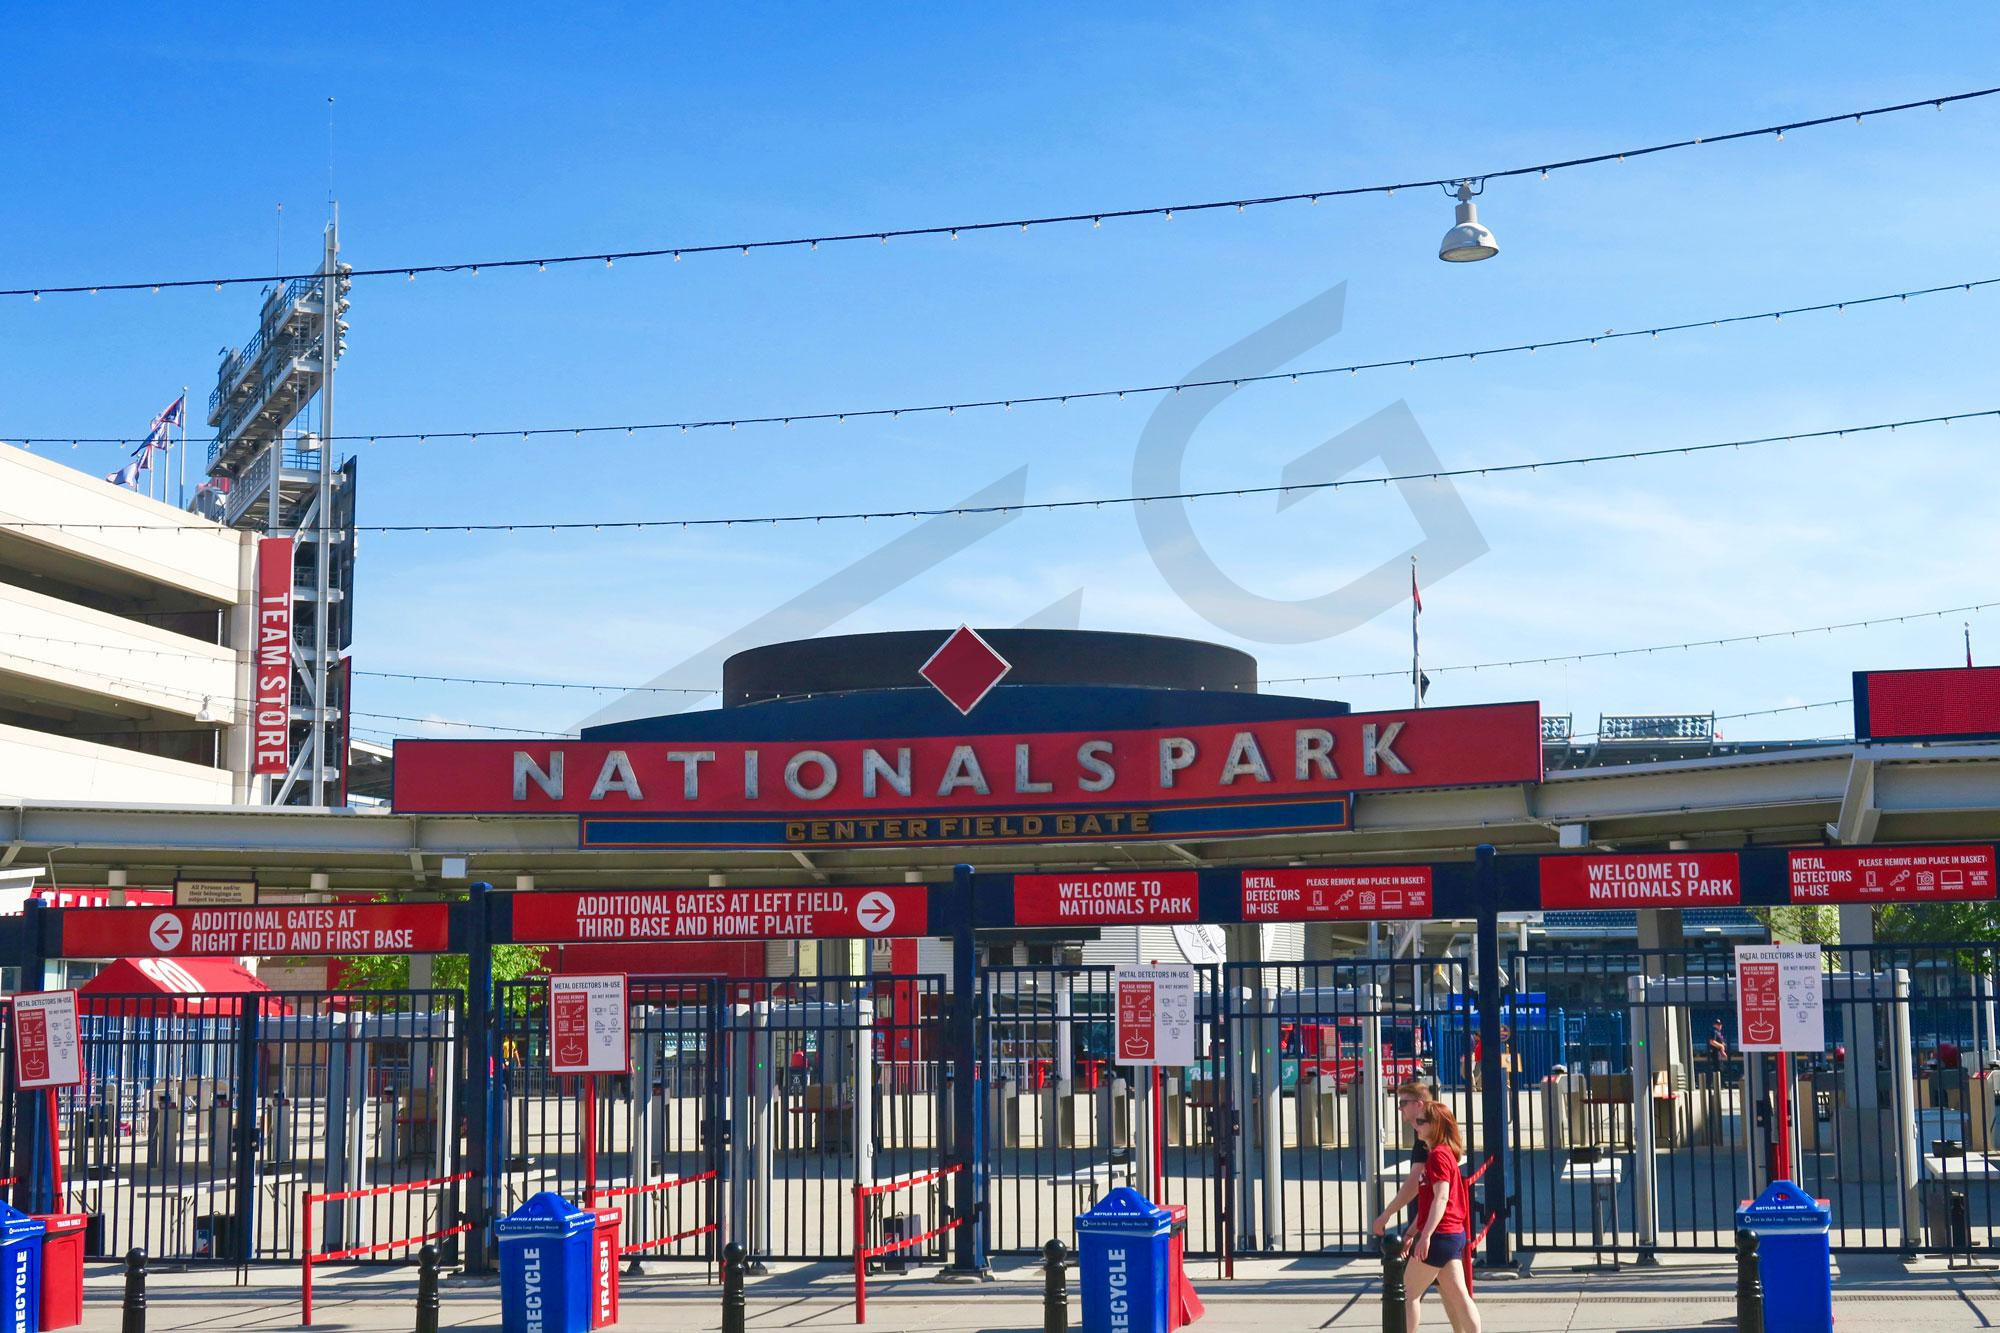 Center Field Gate